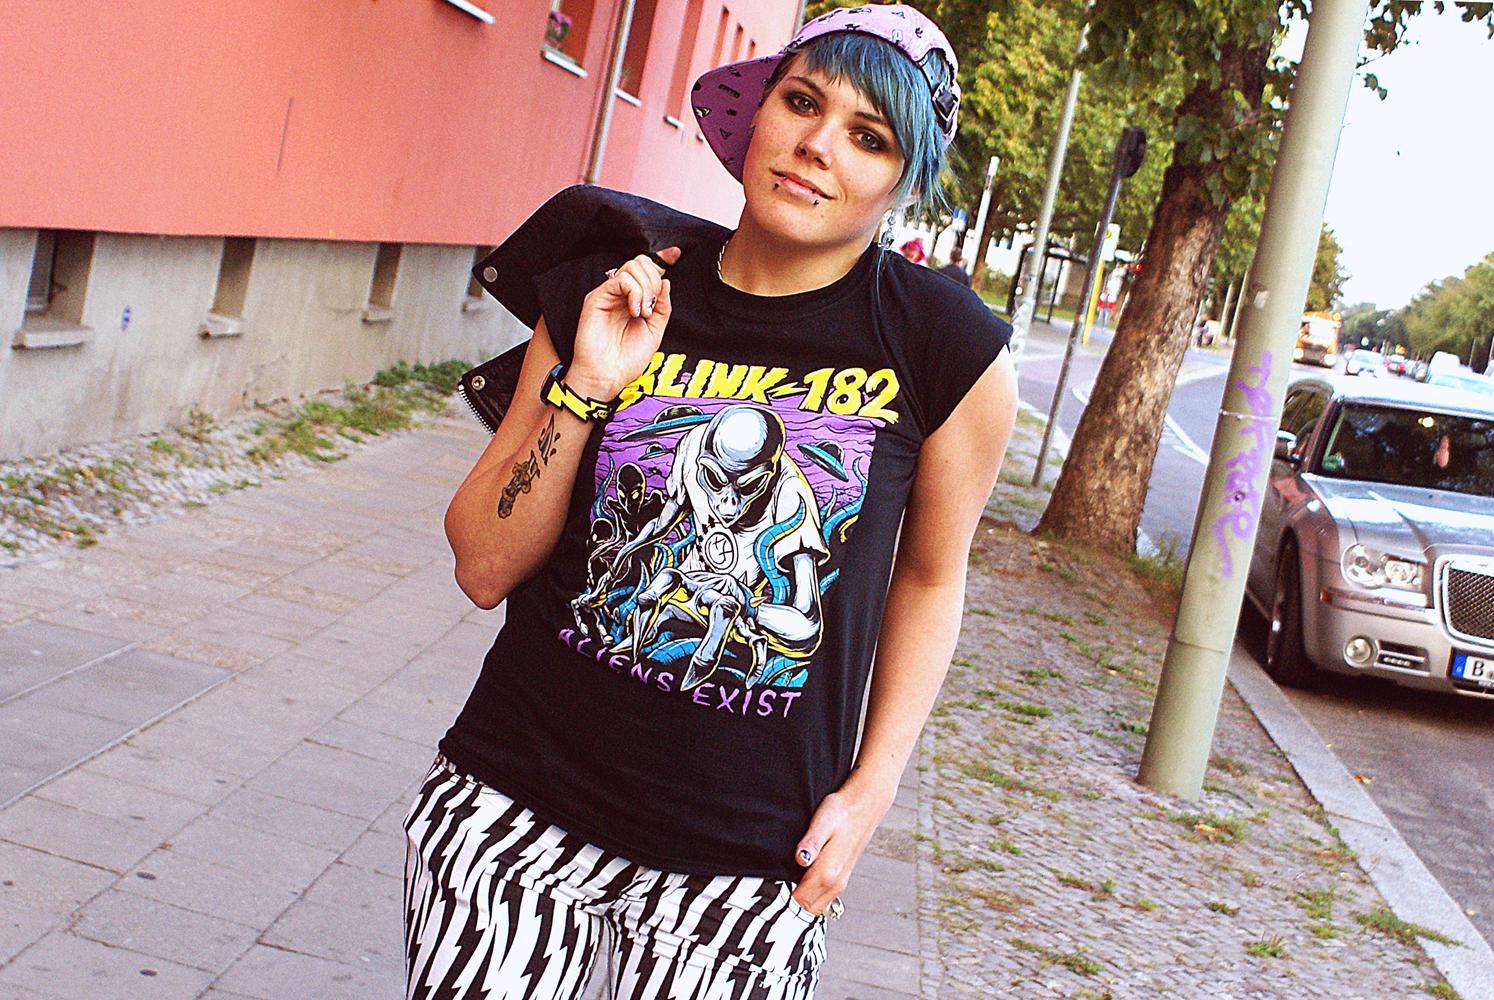 tripp nyc lightning bolt jeans fallen shoes cyan blink aliens exist shirt glamour kills holiday cap lavender purple leather jacket real biker moto chain bandshirt rock swatch jeremy scott